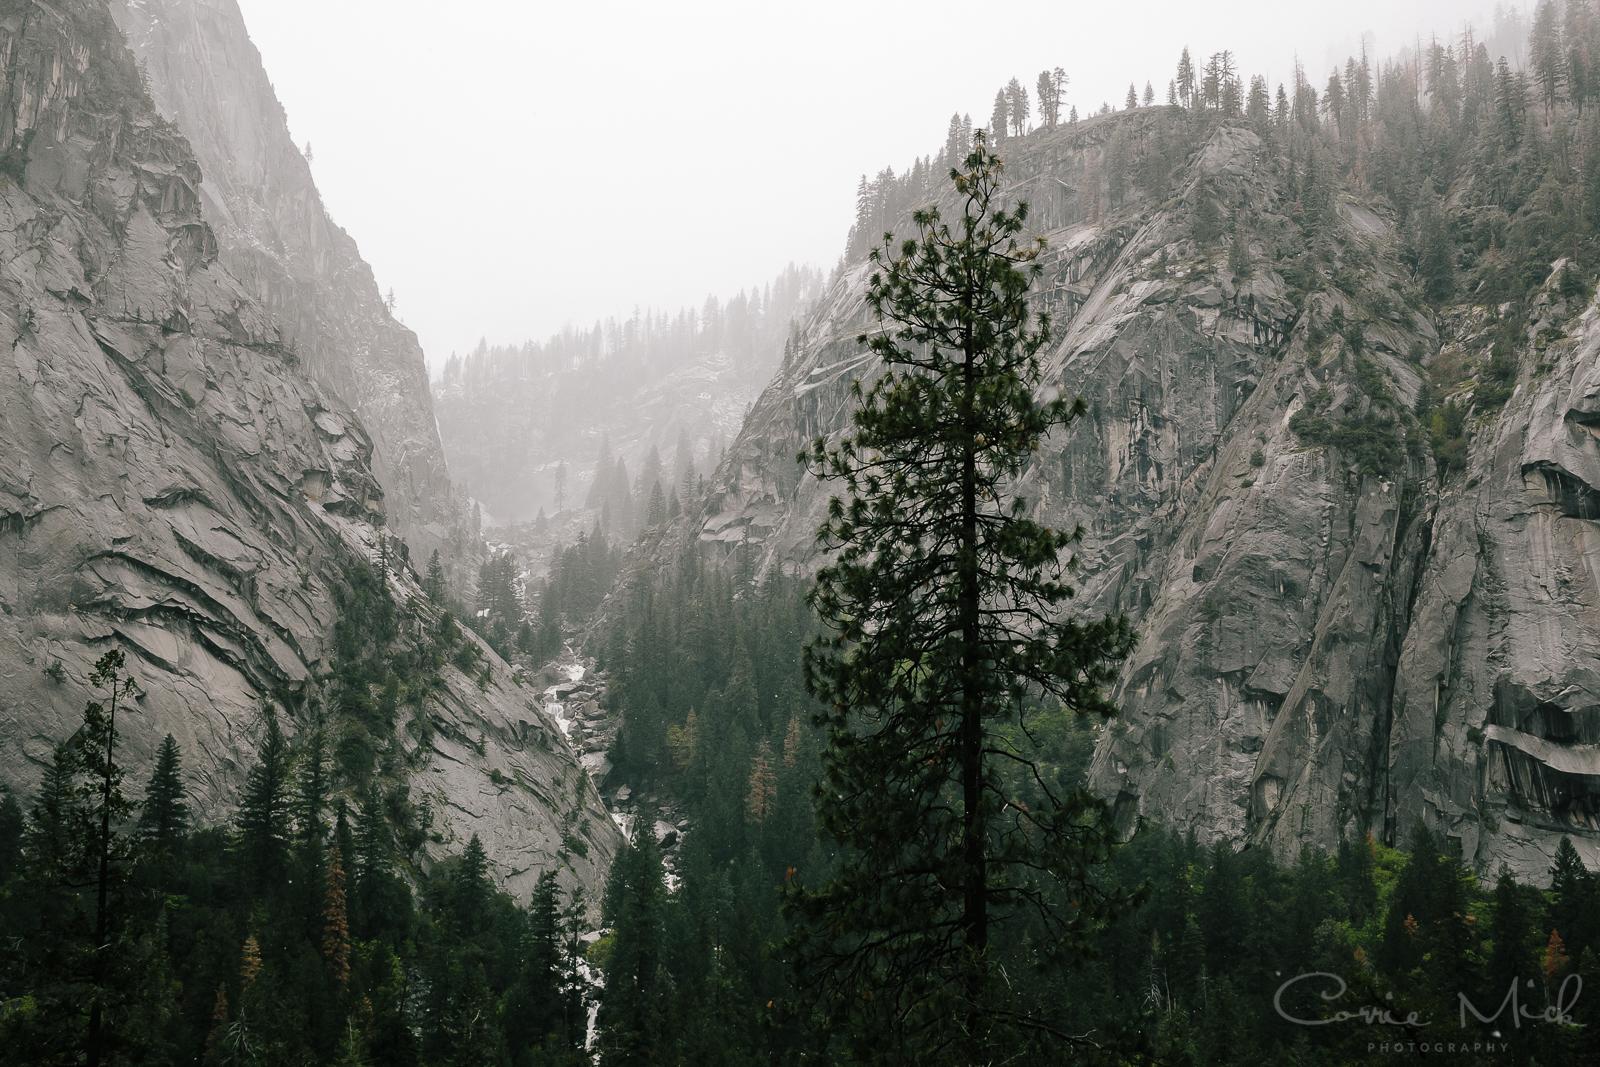 Yosemite April 2016 - Corrie Mick Photography-20.jpg